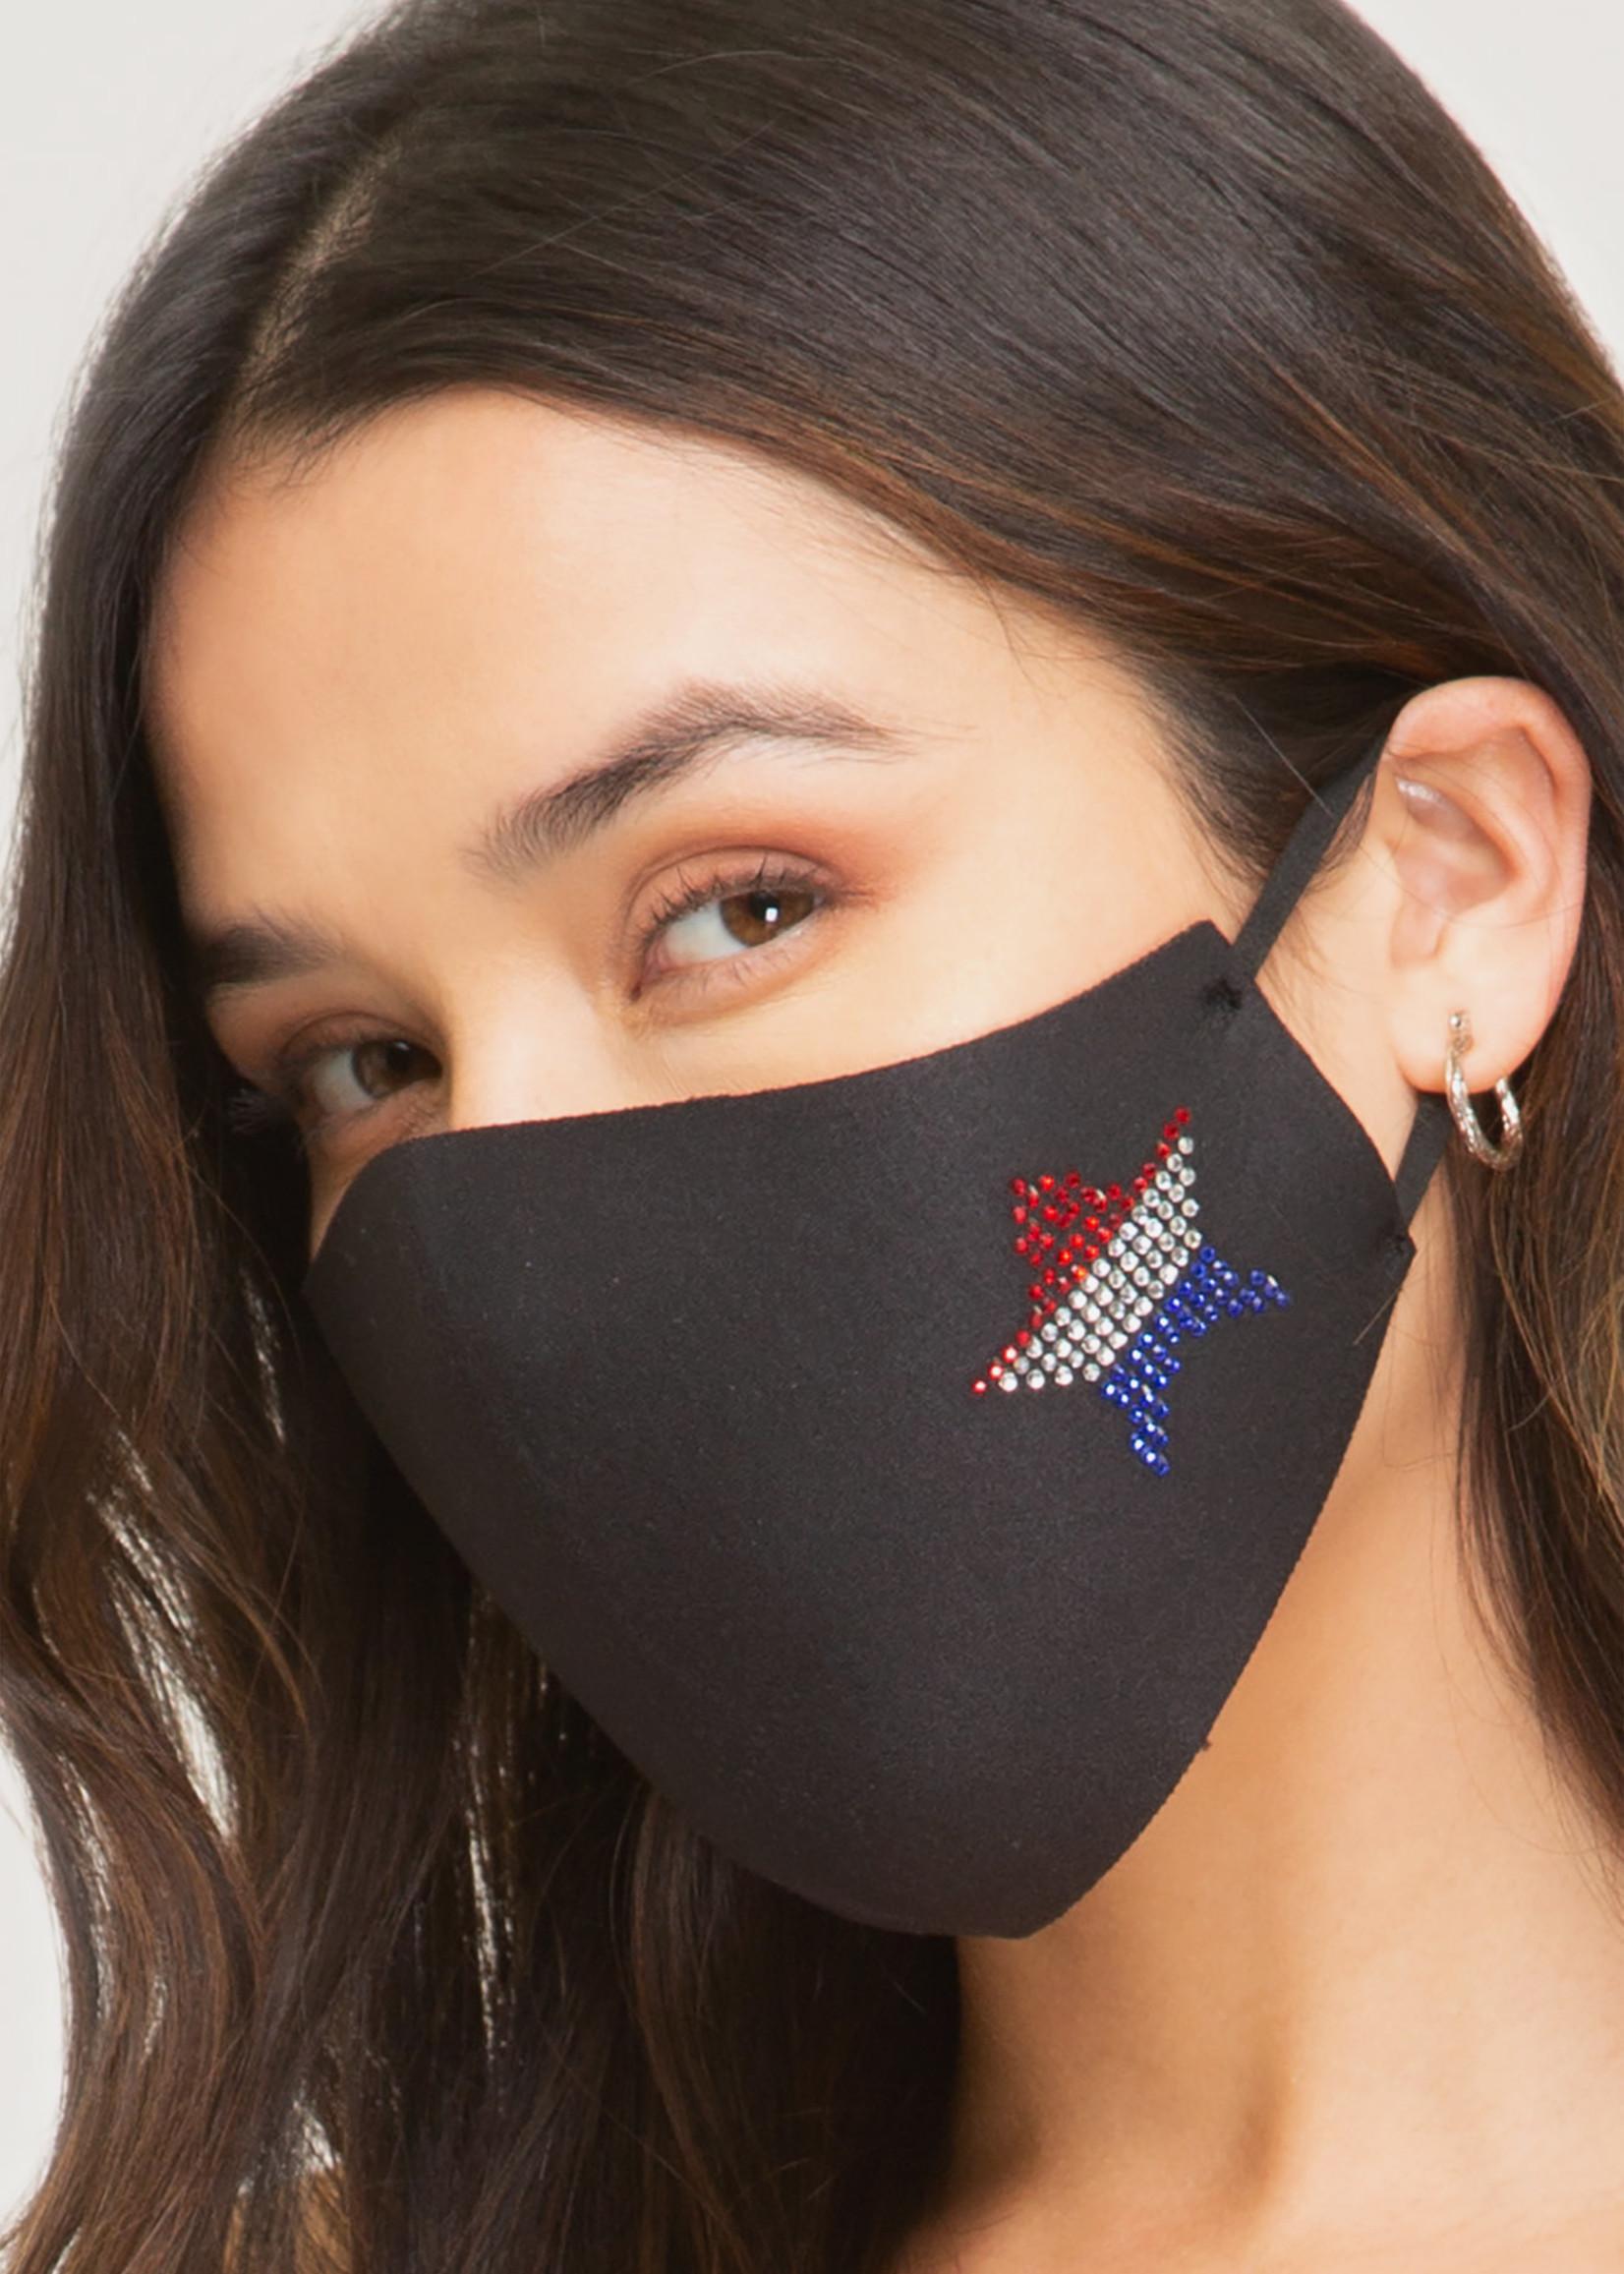 Asst USA Black Cotton Mask w/ Adjustable Earpiece